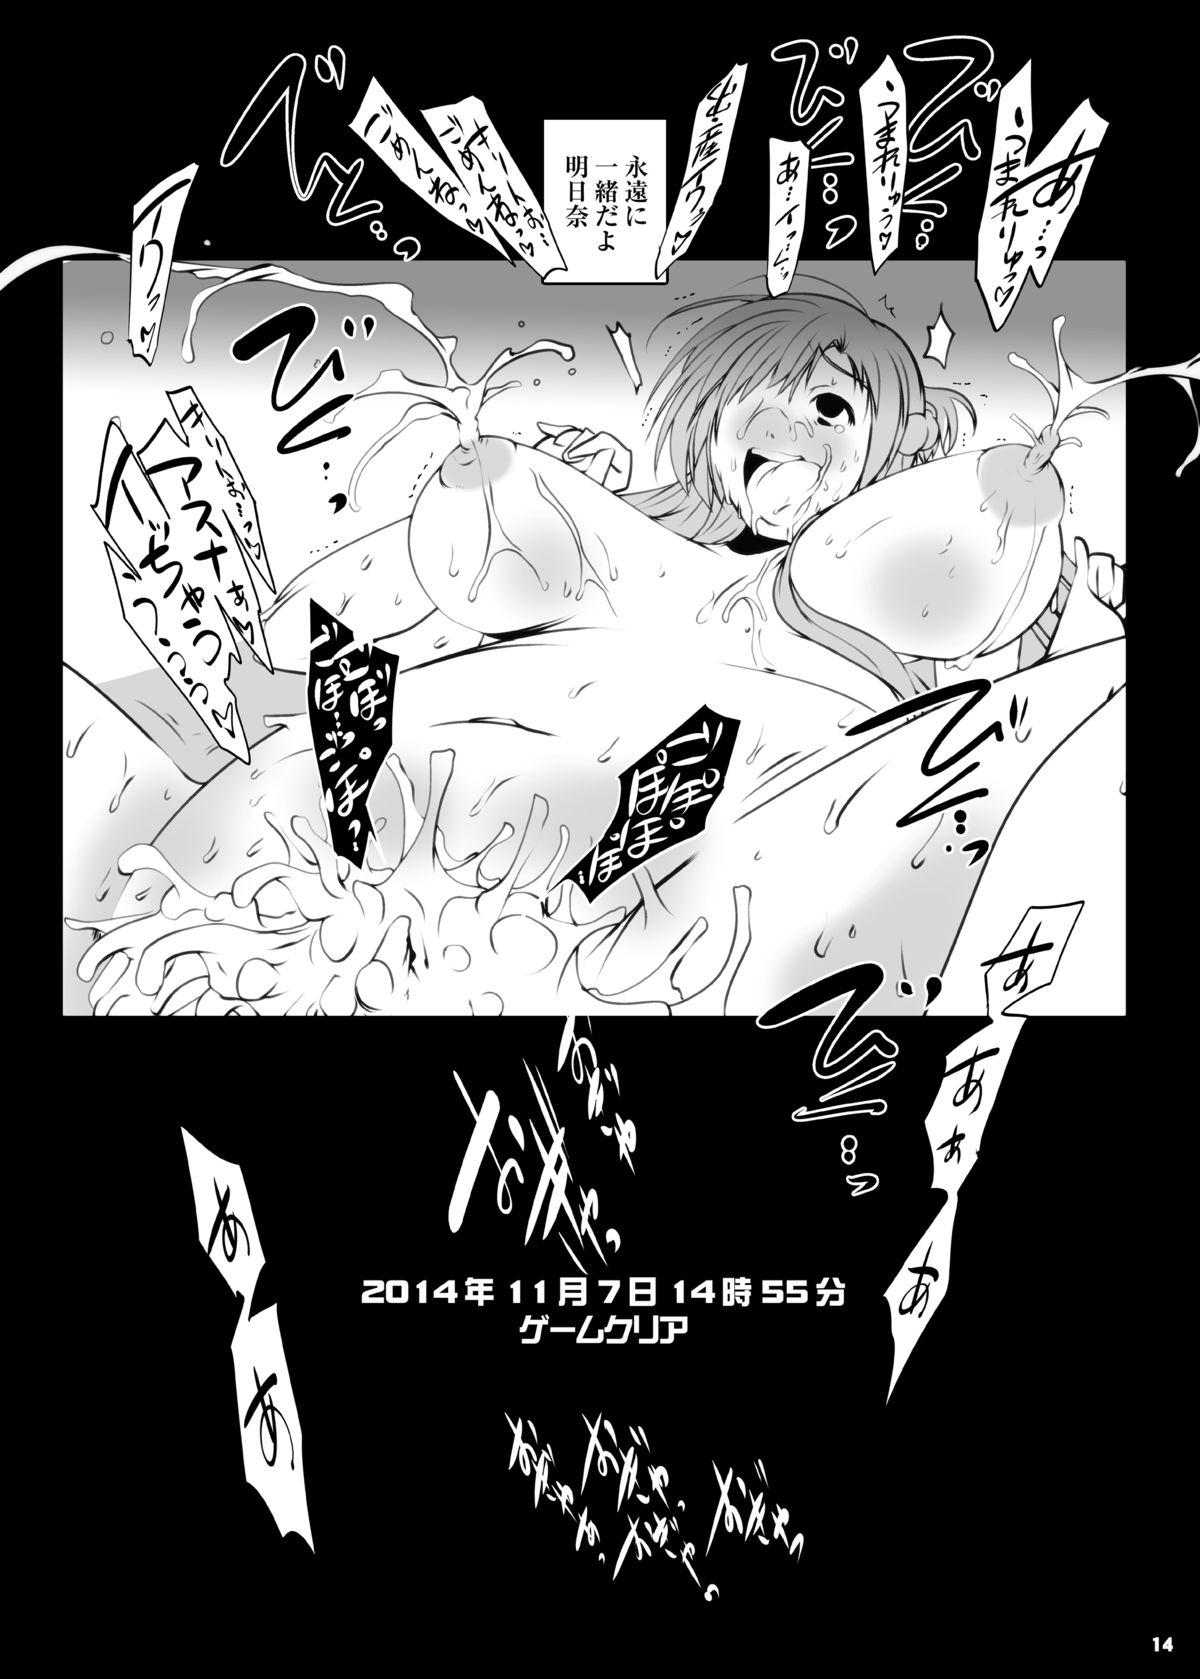 [Suitekiya (Suiteki-ka Yū-min)]Kennai Mating Scandal (1: Einclad / 2: Fairy Dance) SAO The Complete (Sword Art Online) 13